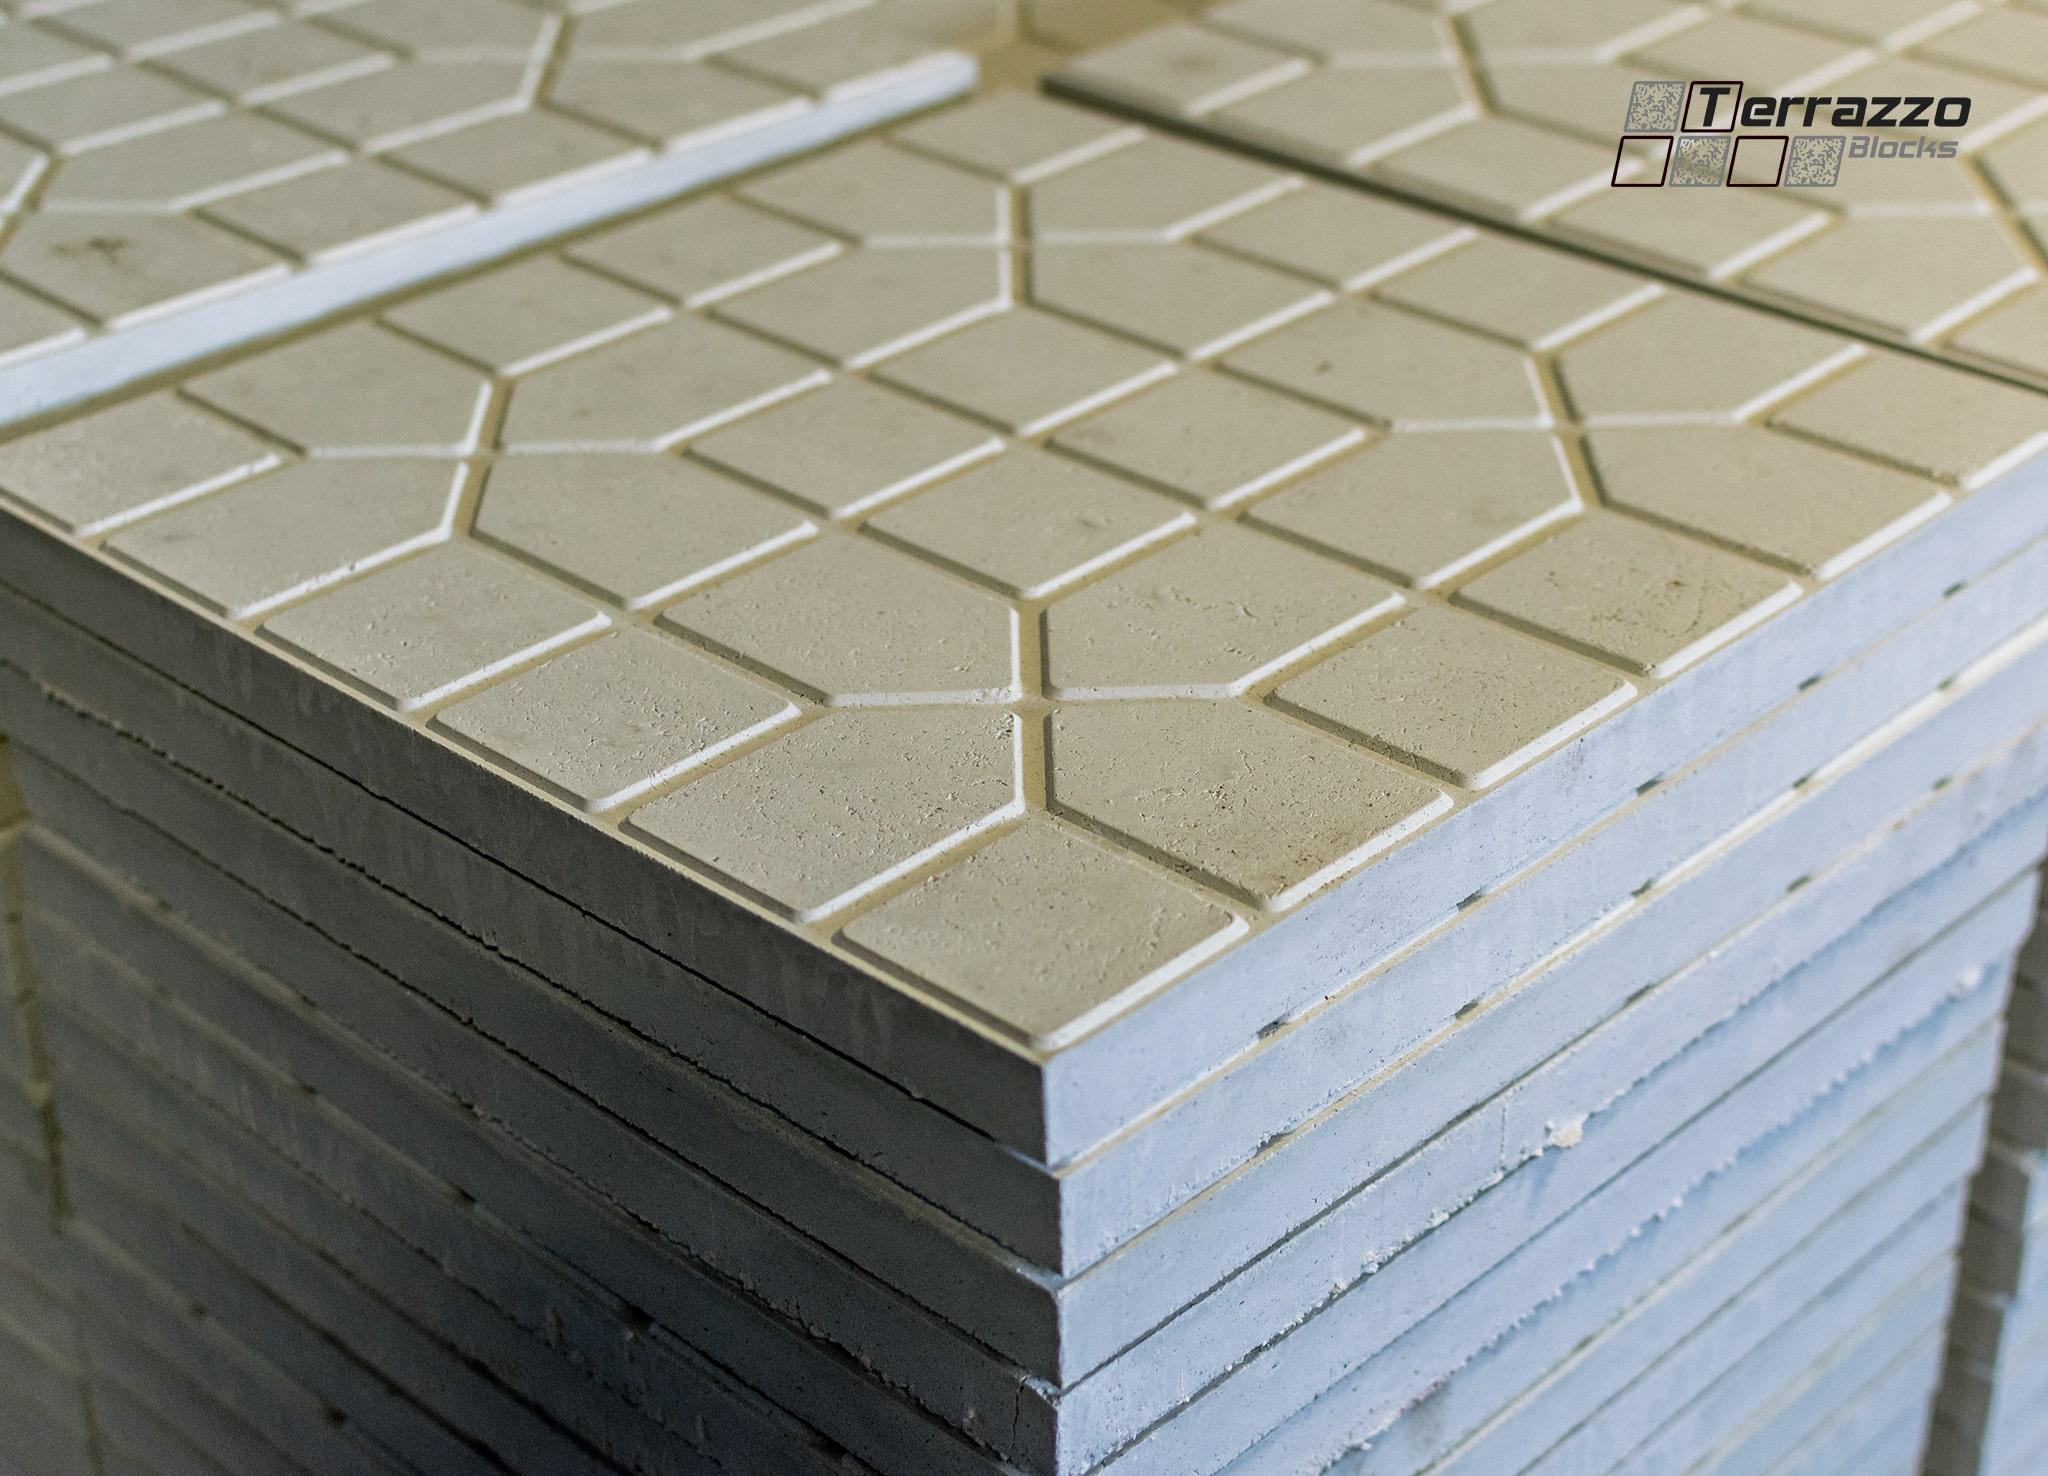 Производство терраццо - плитка без полировки